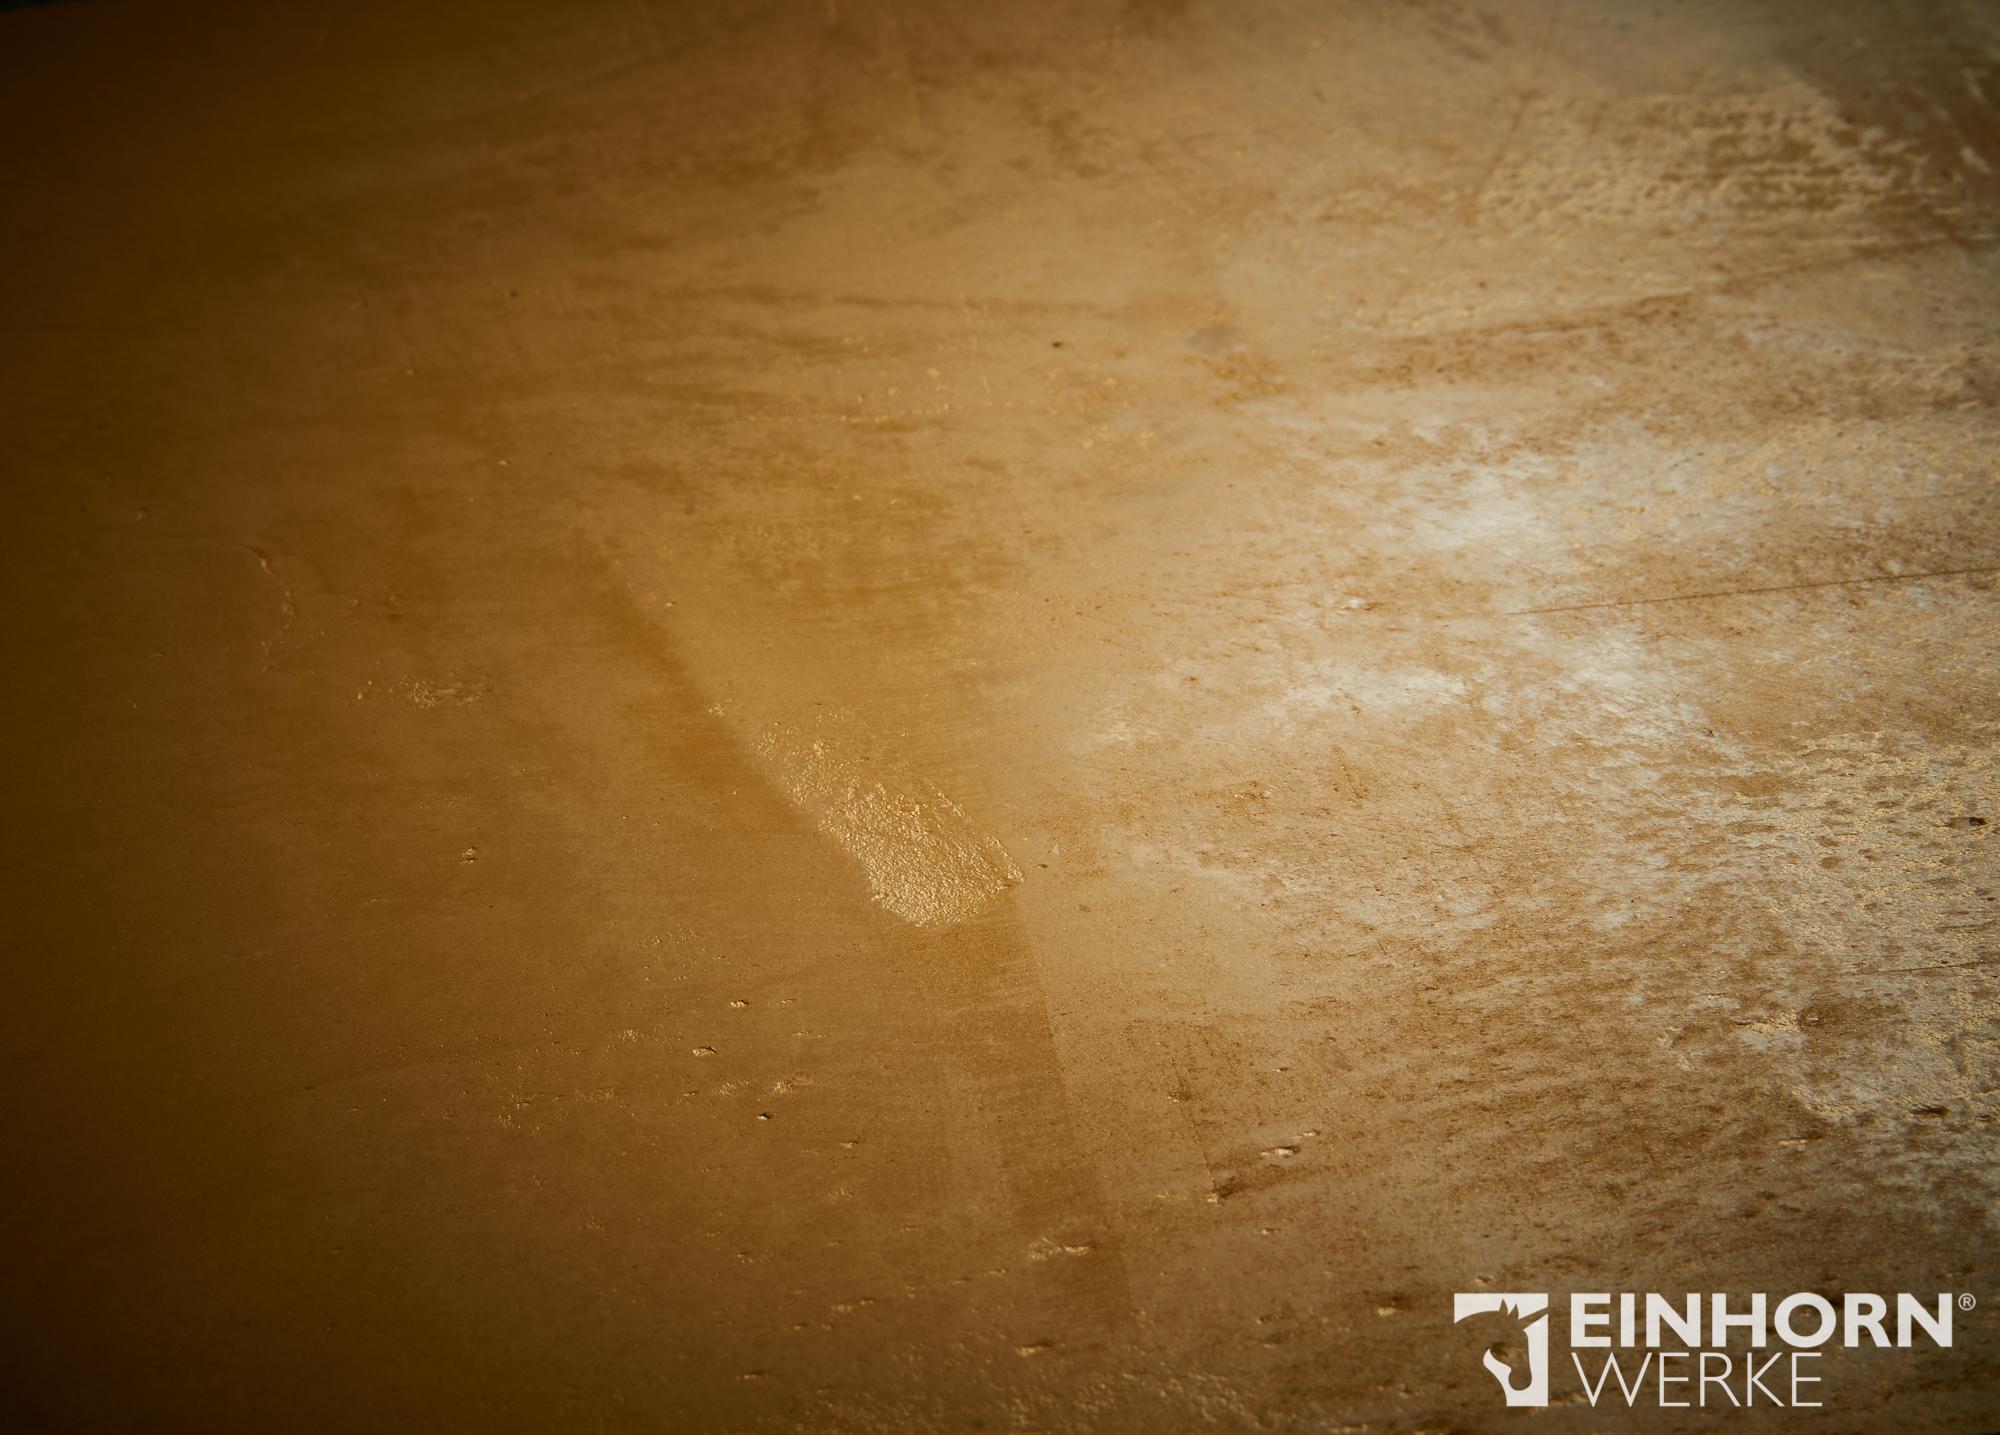 STUCCORINO 2507 + STUCCORINO Effect - Feingold Wände gestalten